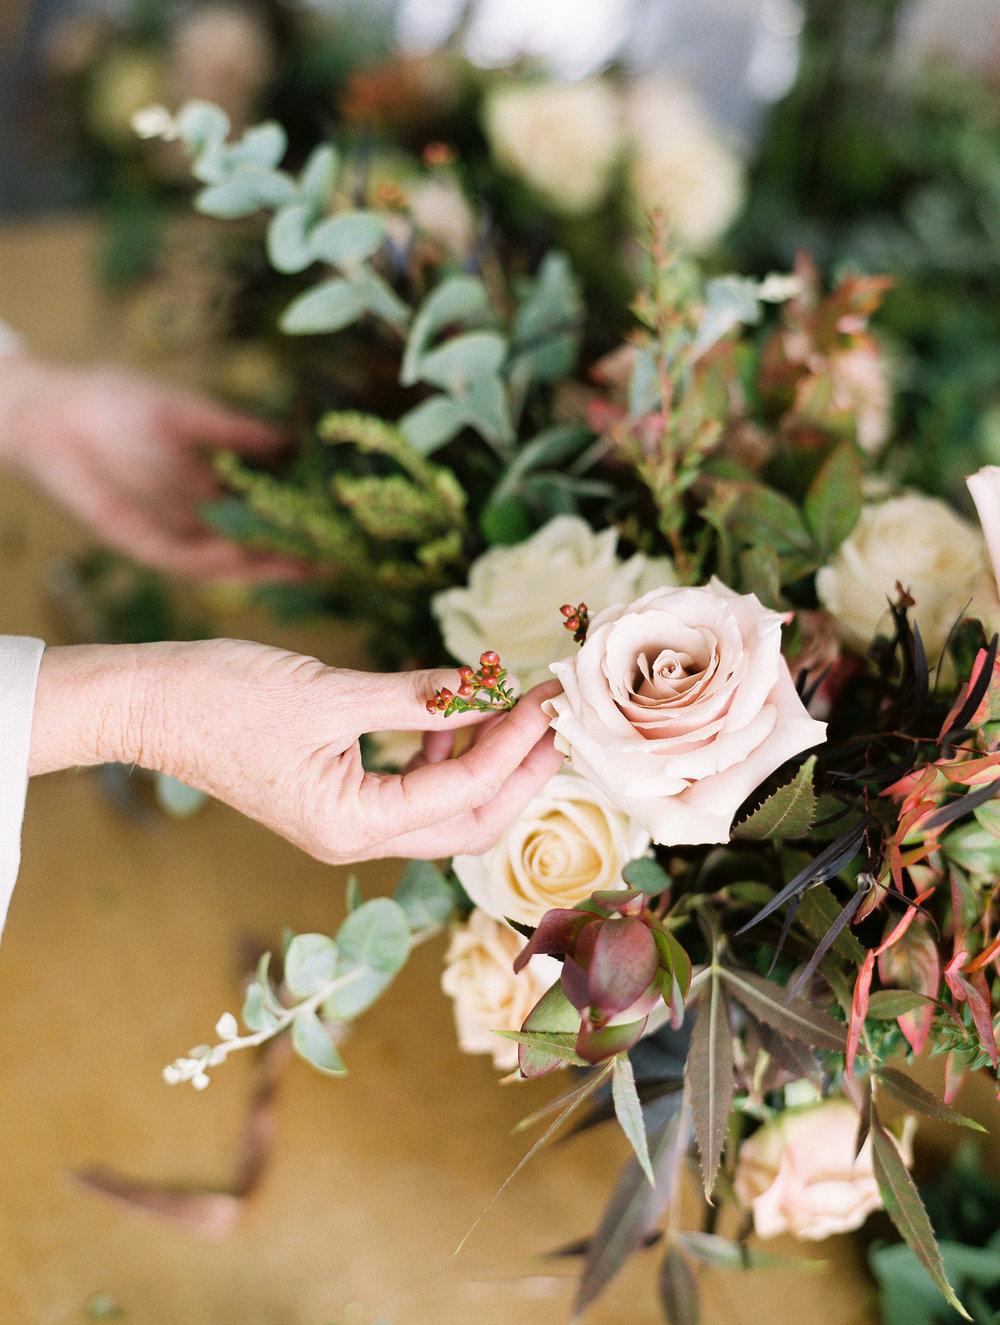 sandra-chau-stylist-floral-florist-branding-lifestyle-shoot-we-are-origami207.jpg